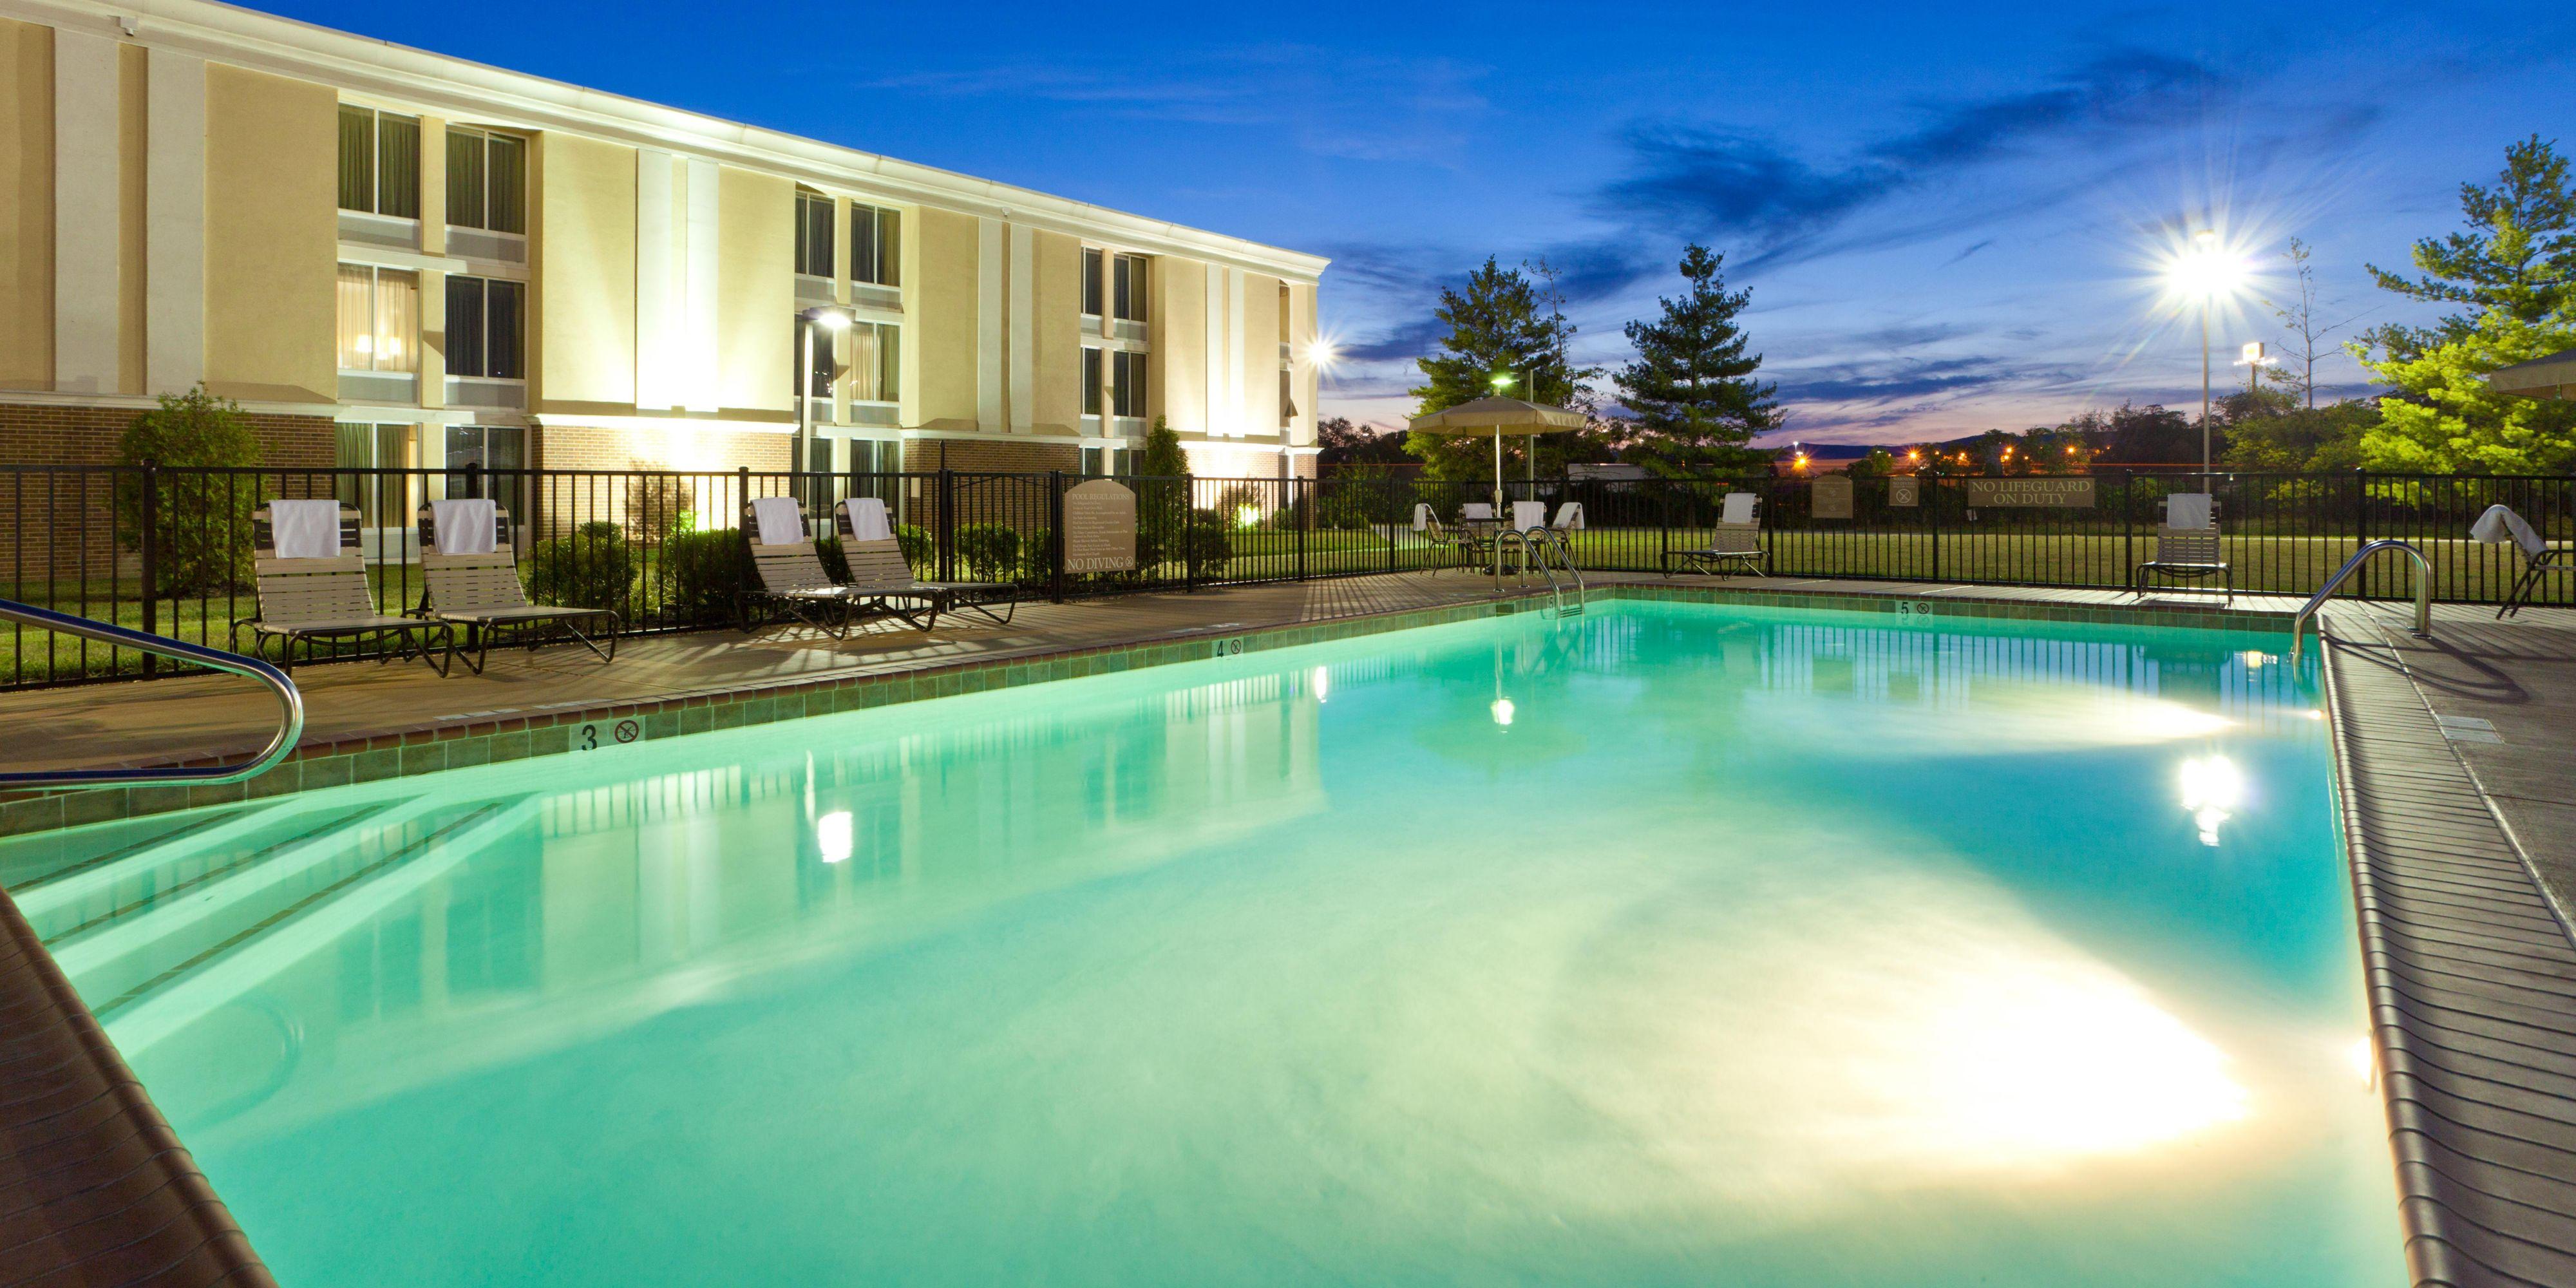 Holiday Inn Express Woodstock-Shenandoah Valley Hotel by IHG